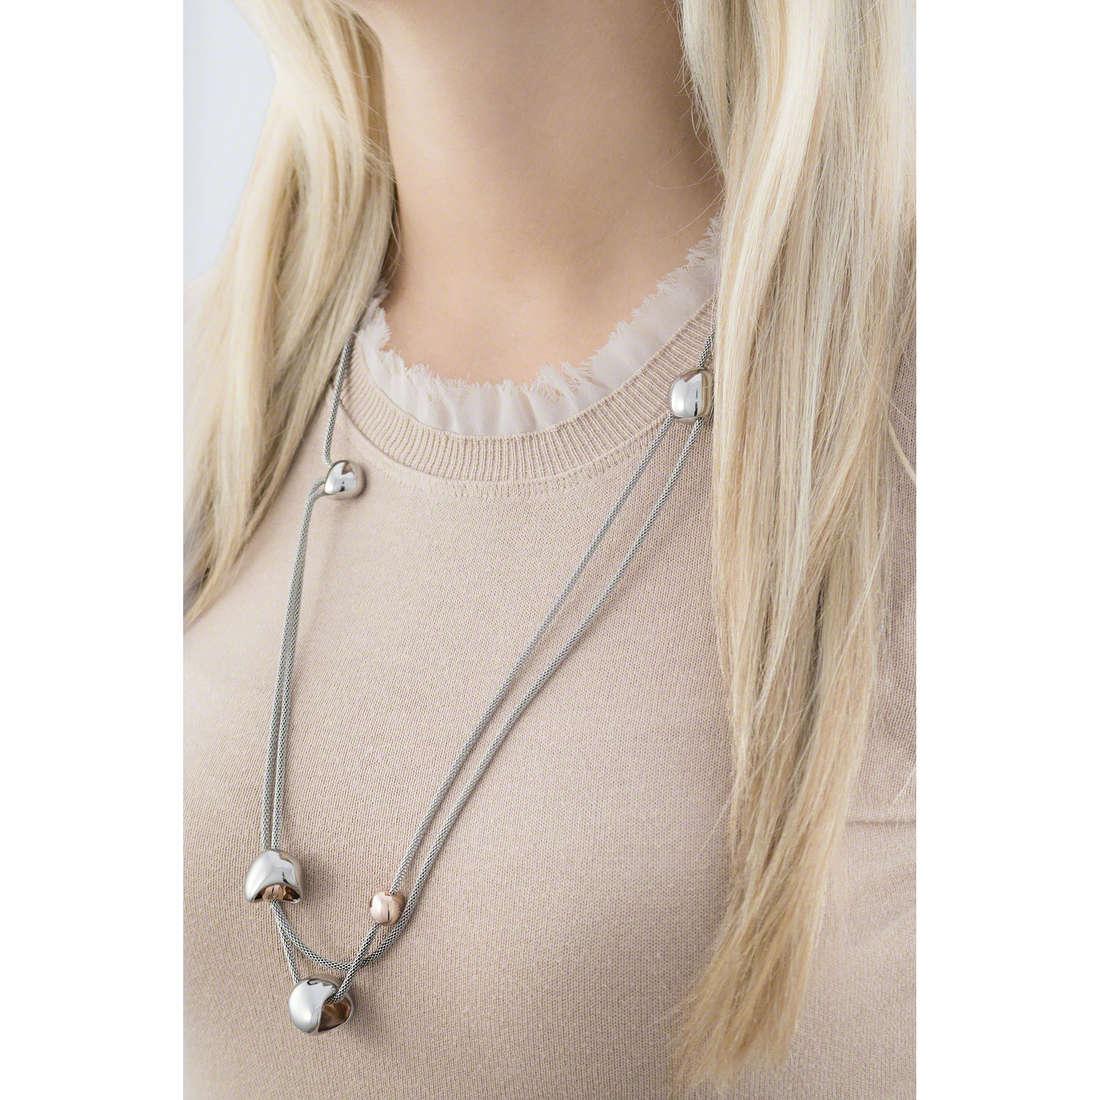 Breil collane Waterfall donna TJ1820 indosso